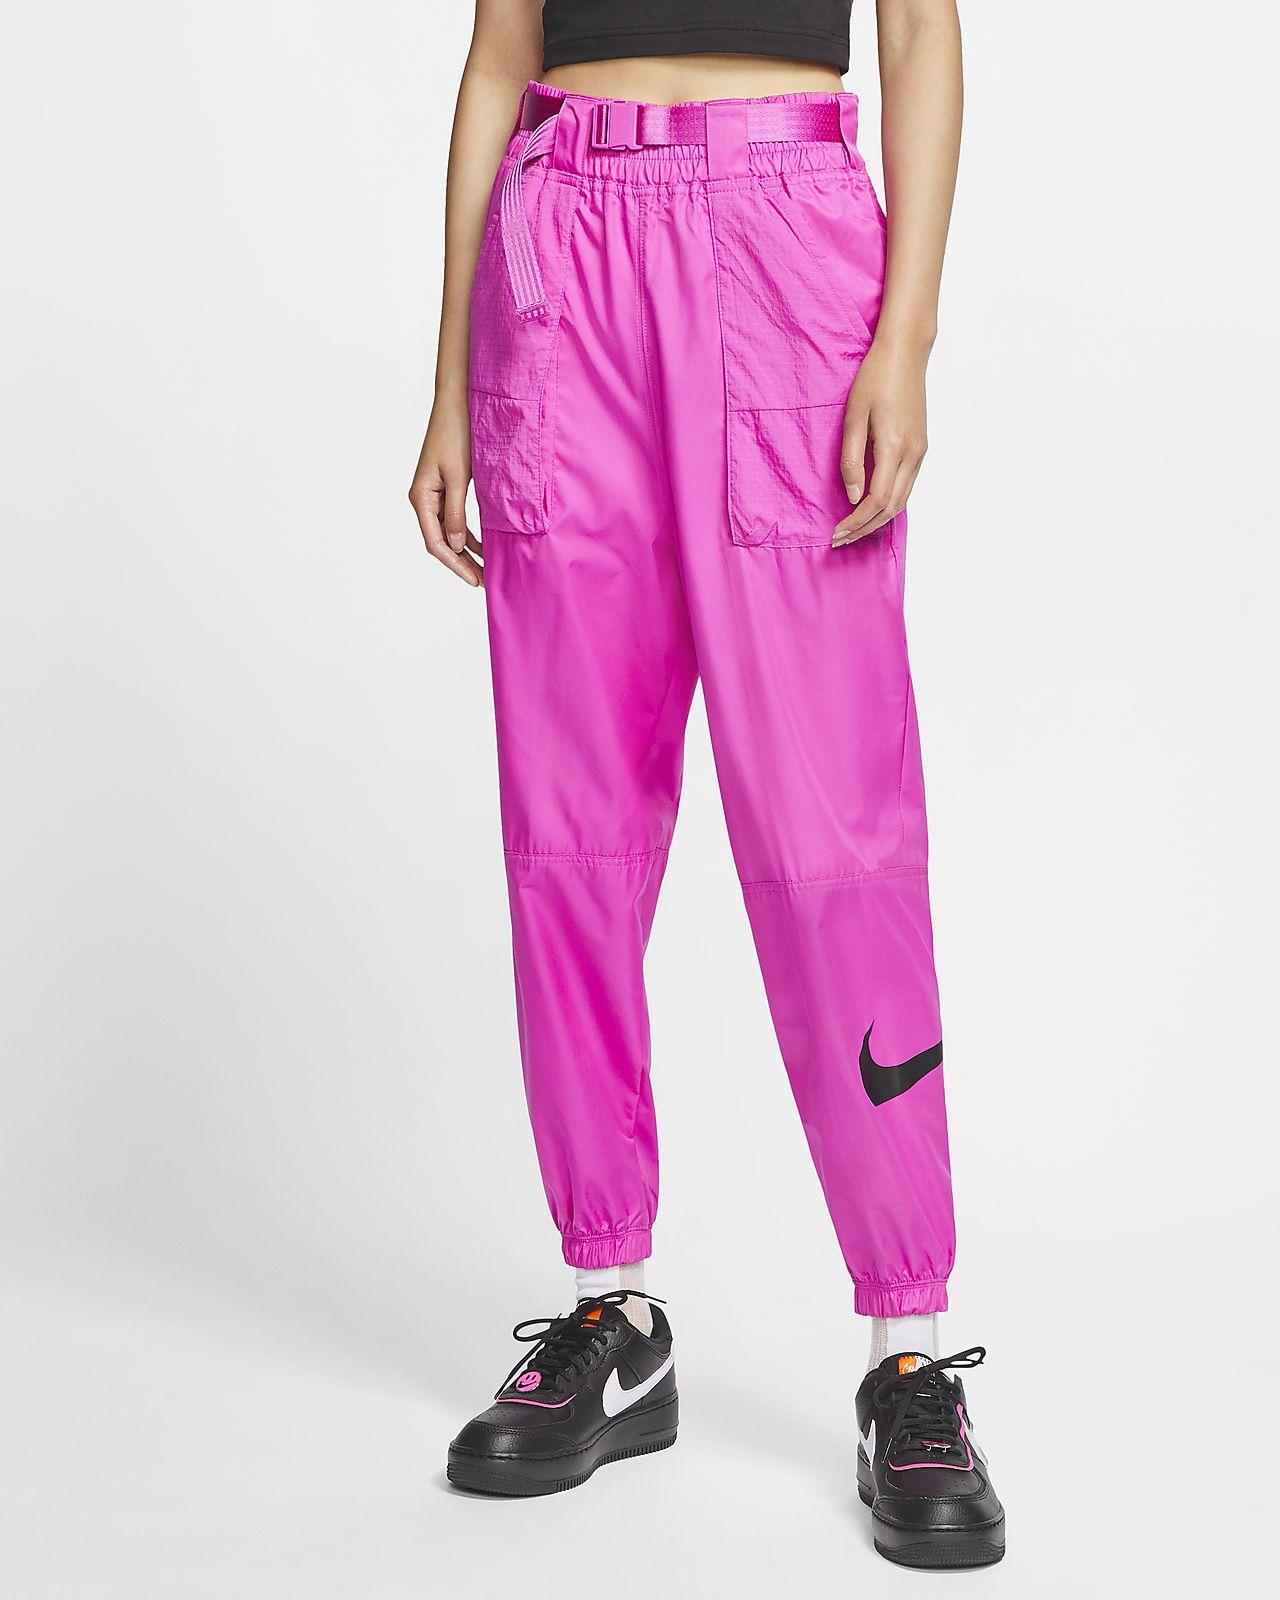 Nike Sportswear Geweven damesbroek met Swoosh